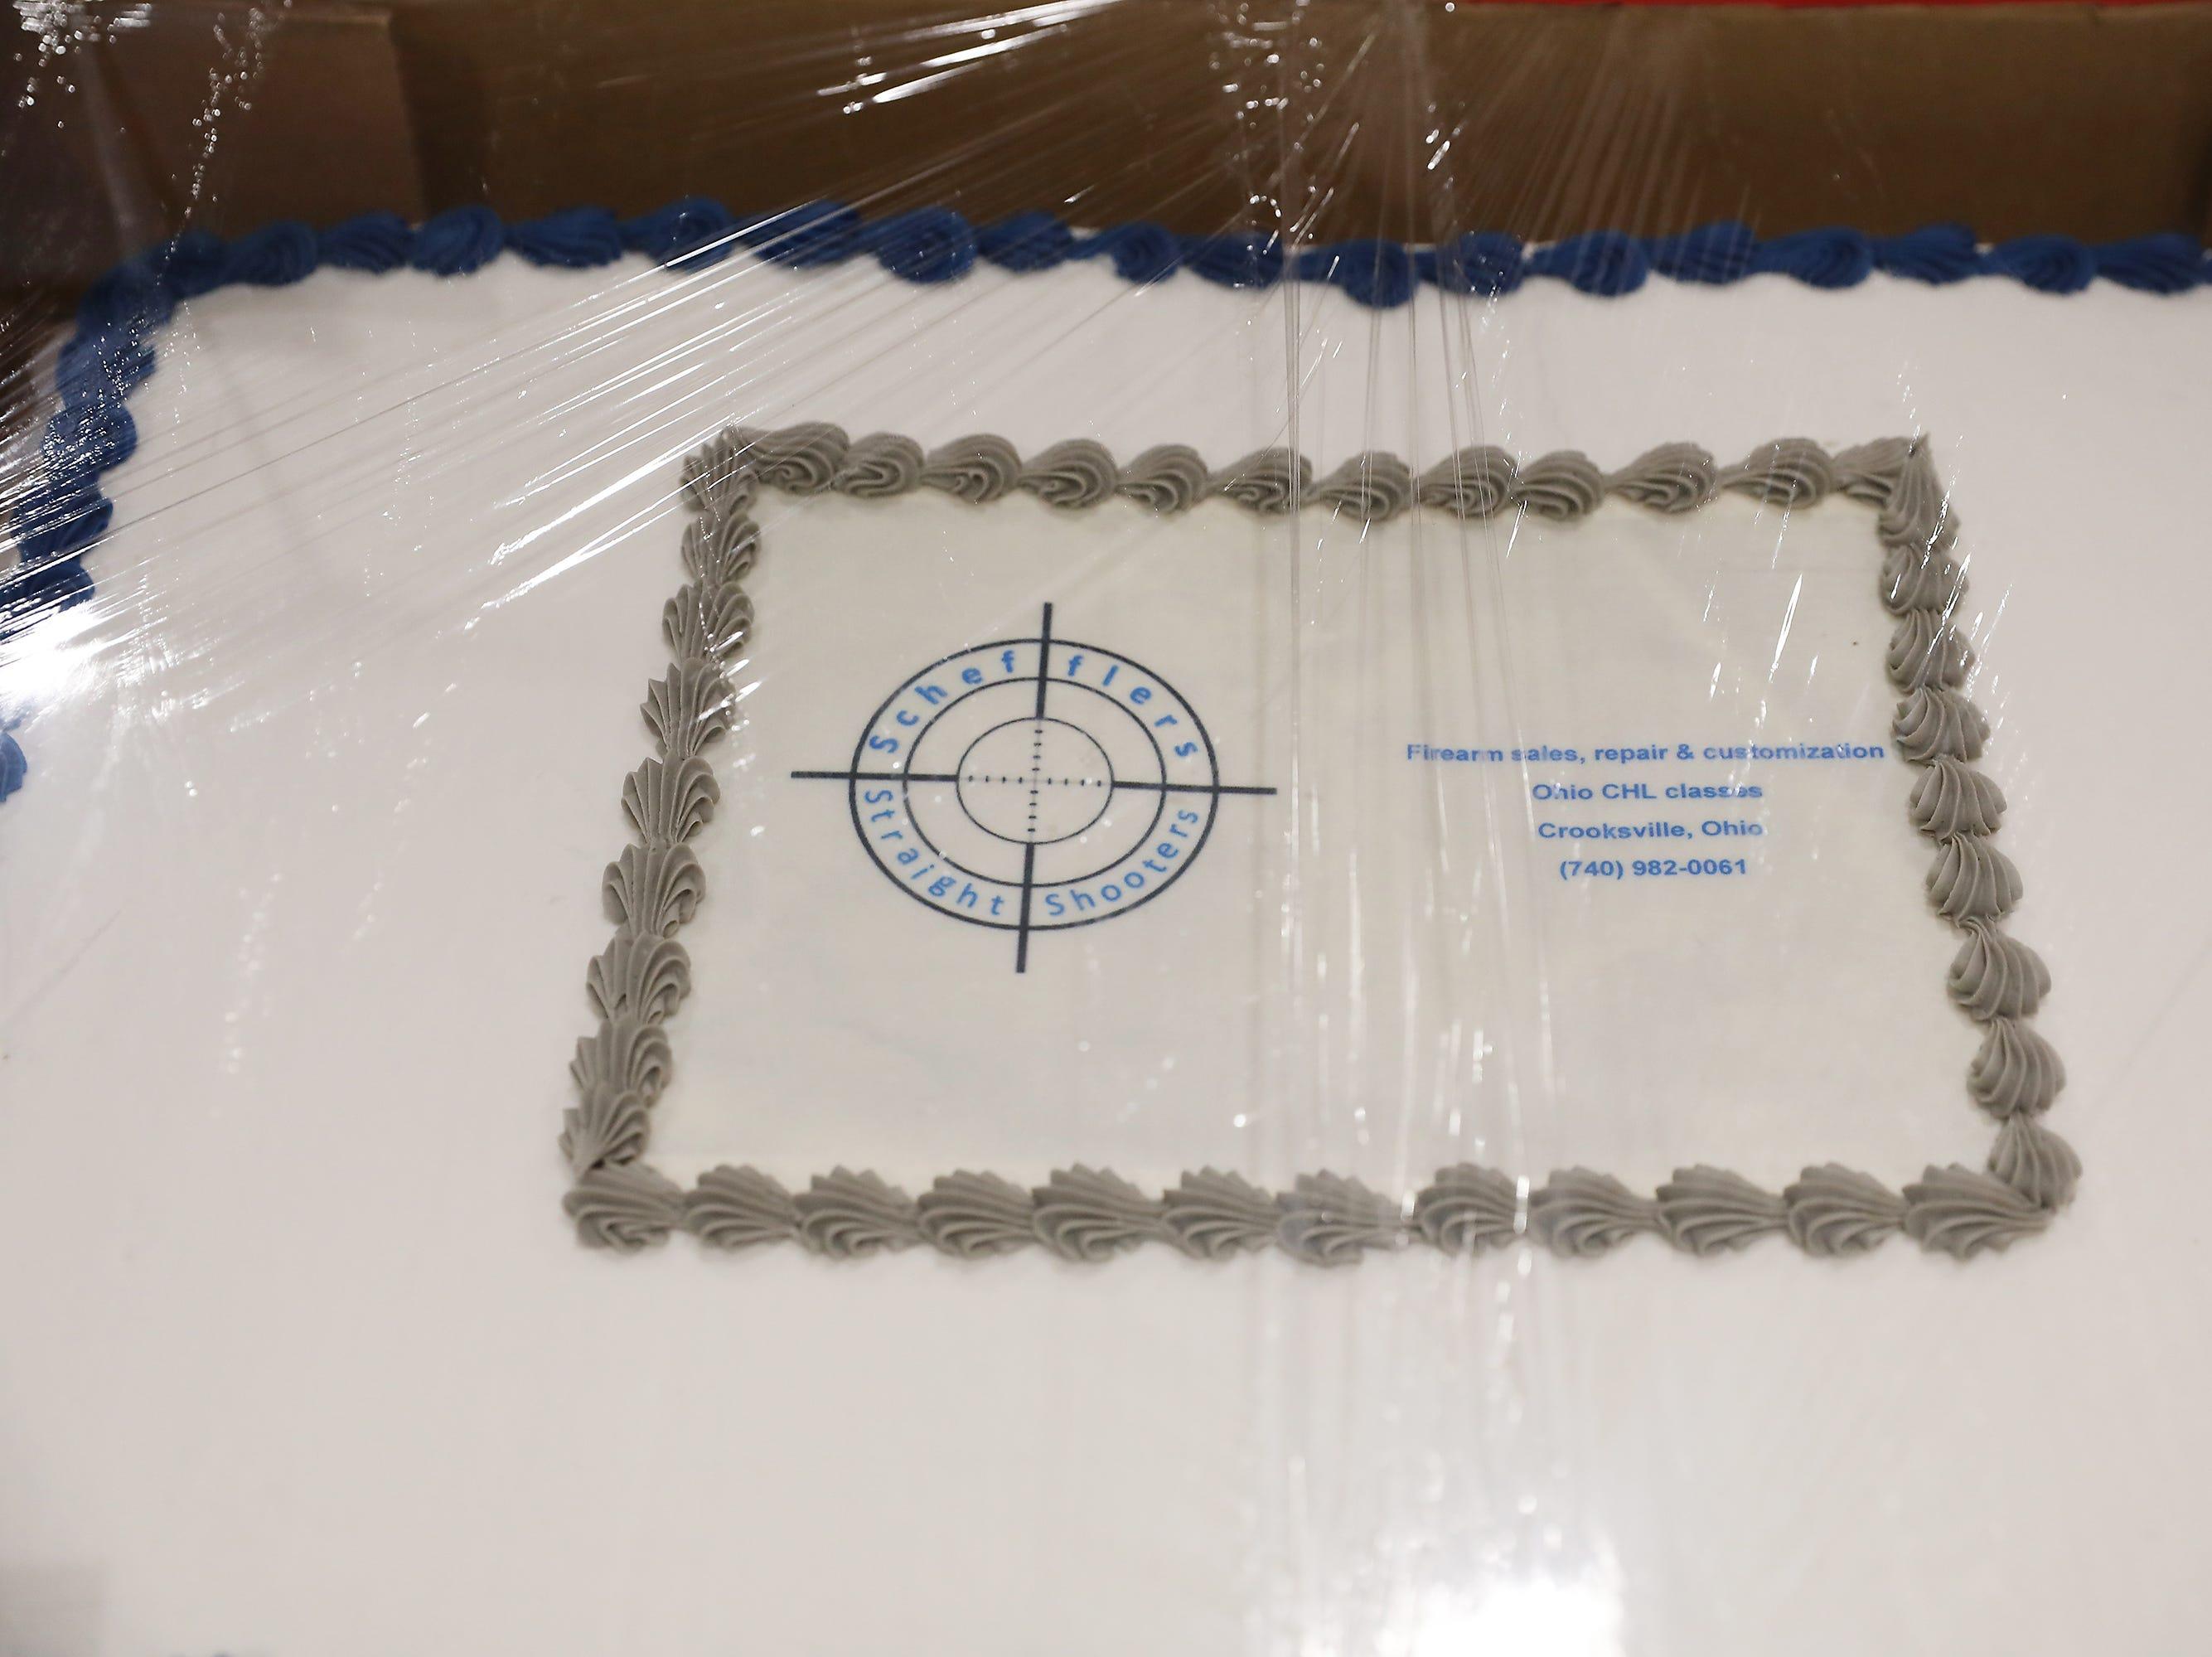 1:30 P.M. Friday cake 314 Scheffler's Straight Shooters - custom Duracoat gift card, discount on Ohio CHL class, custom Kydex Holster gift card; $310